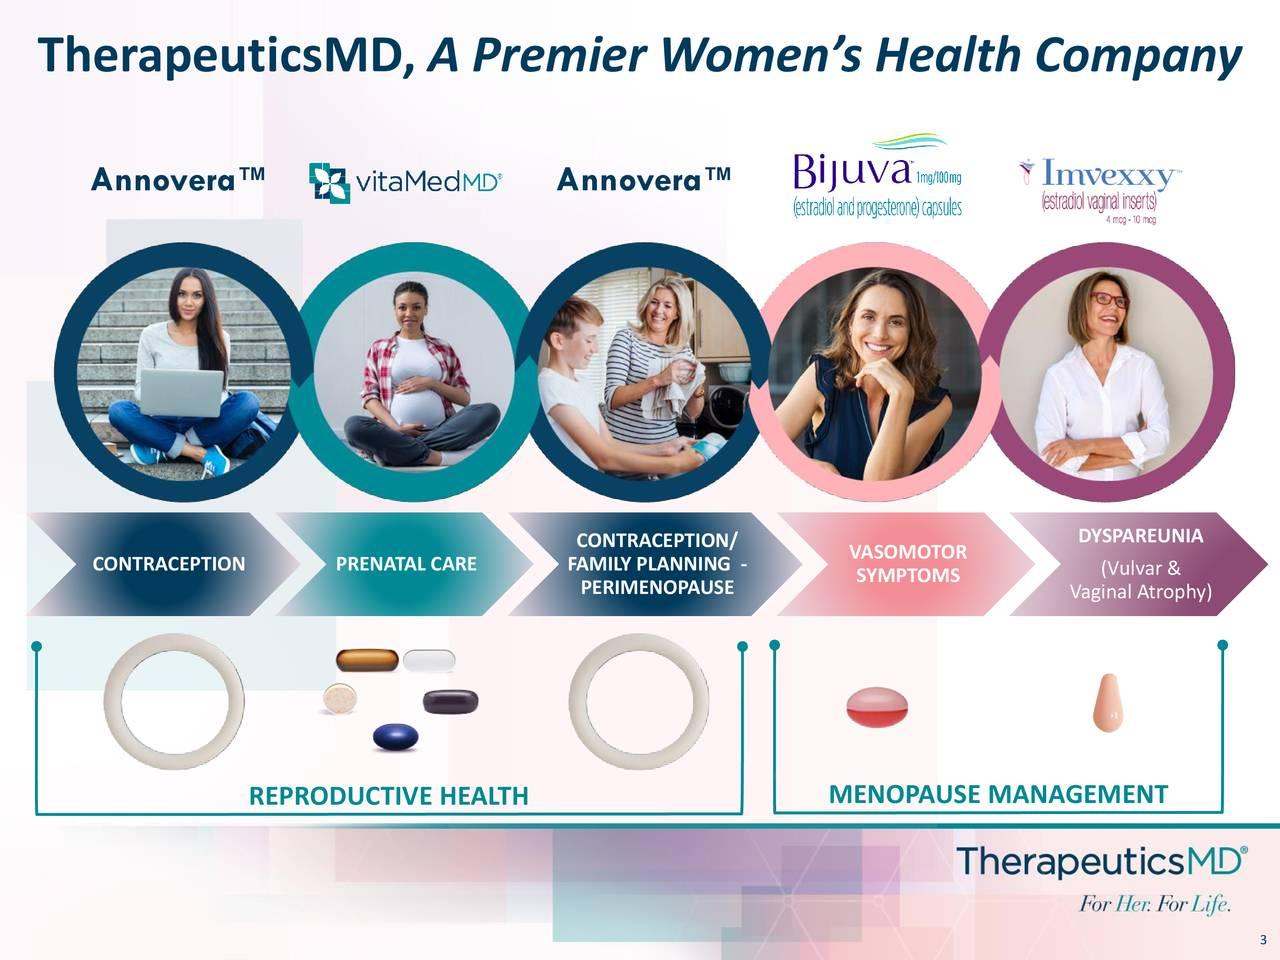 Annovera ™ Annovera ™ DYSPAREUNIA CONTRACEPTION PRENATAL CARE FAMILY PLANNING - VASOMOTOR PERIMENOPAUSE SYMPTOMS Vaginal Atrophy) REPRODUCTIVE HEALTH MENOPAUSE MANAGEMENT 3